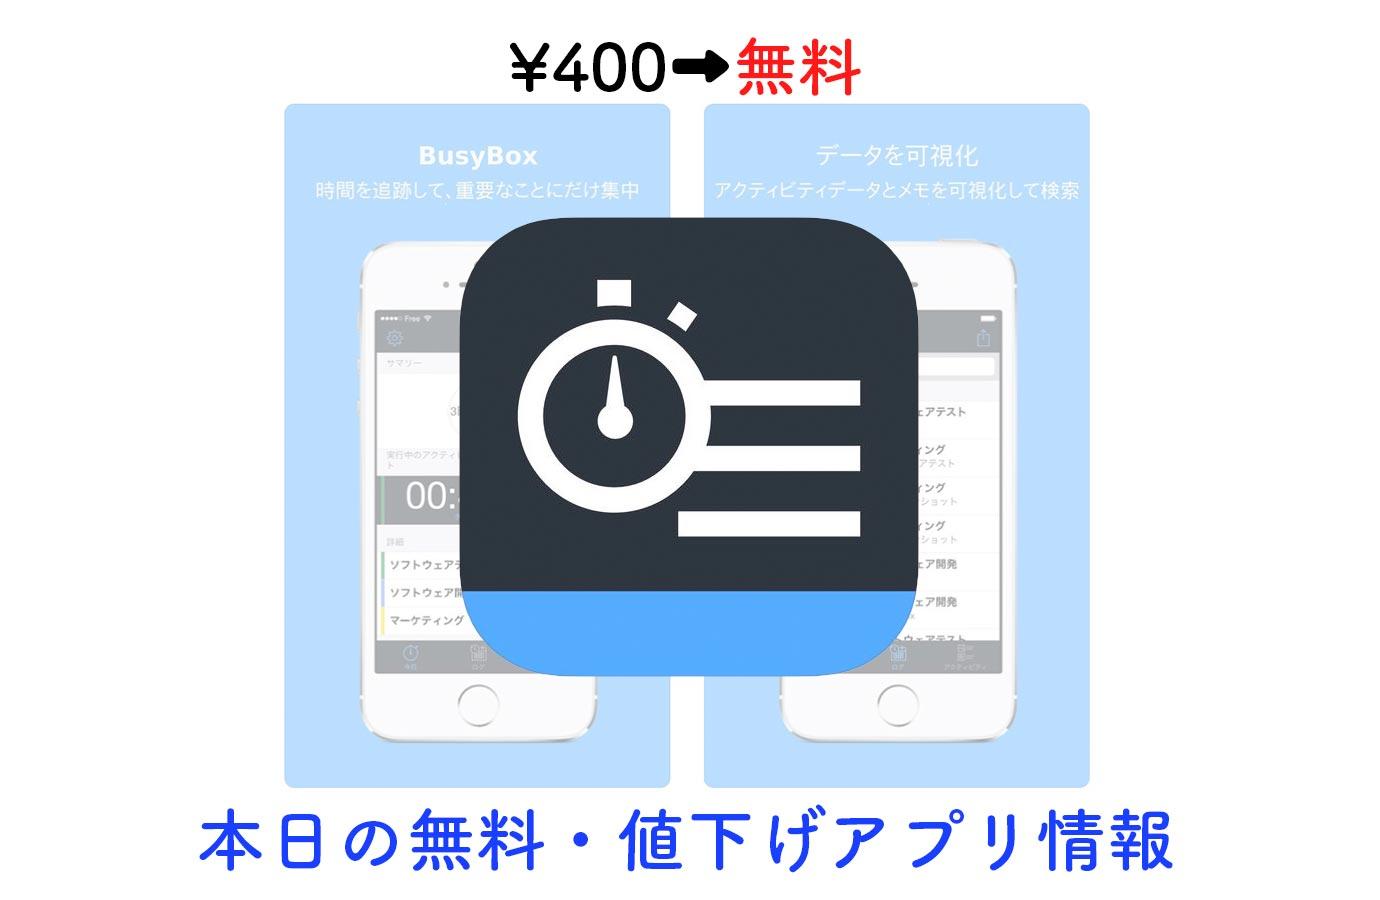 Appsale0424